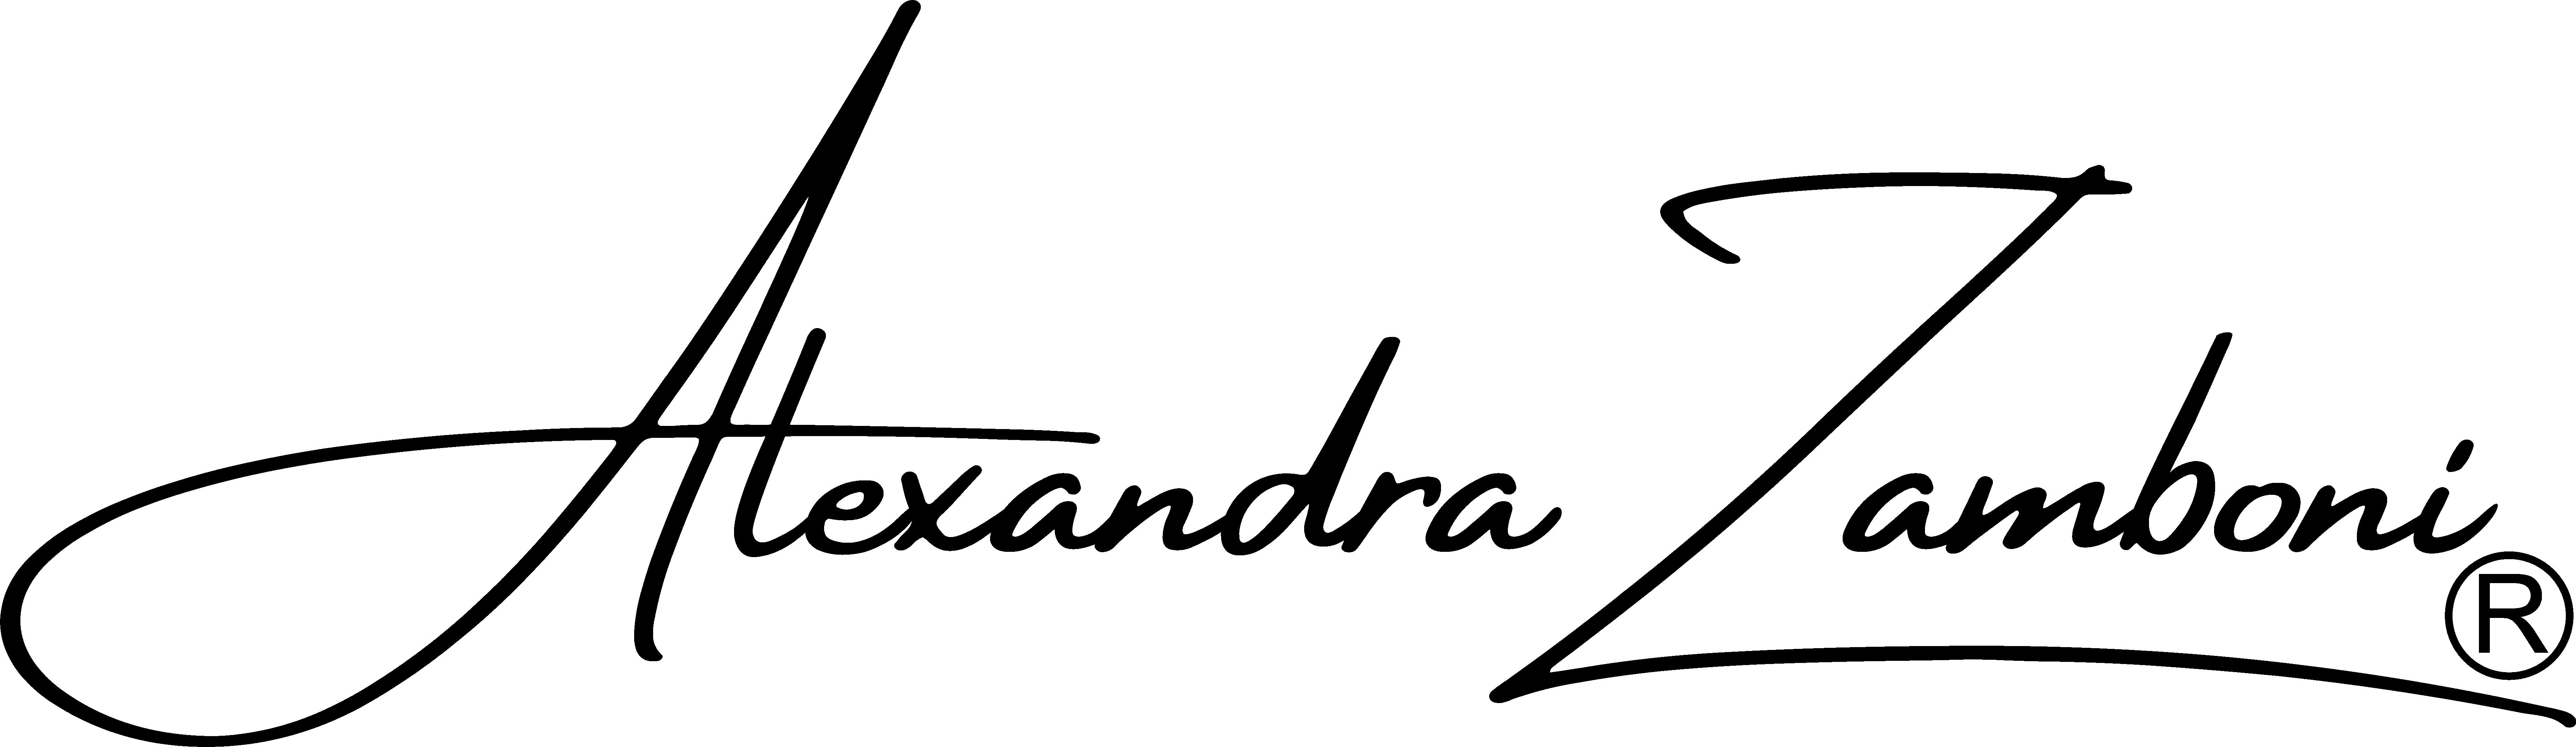 Alexandrazambonijoias